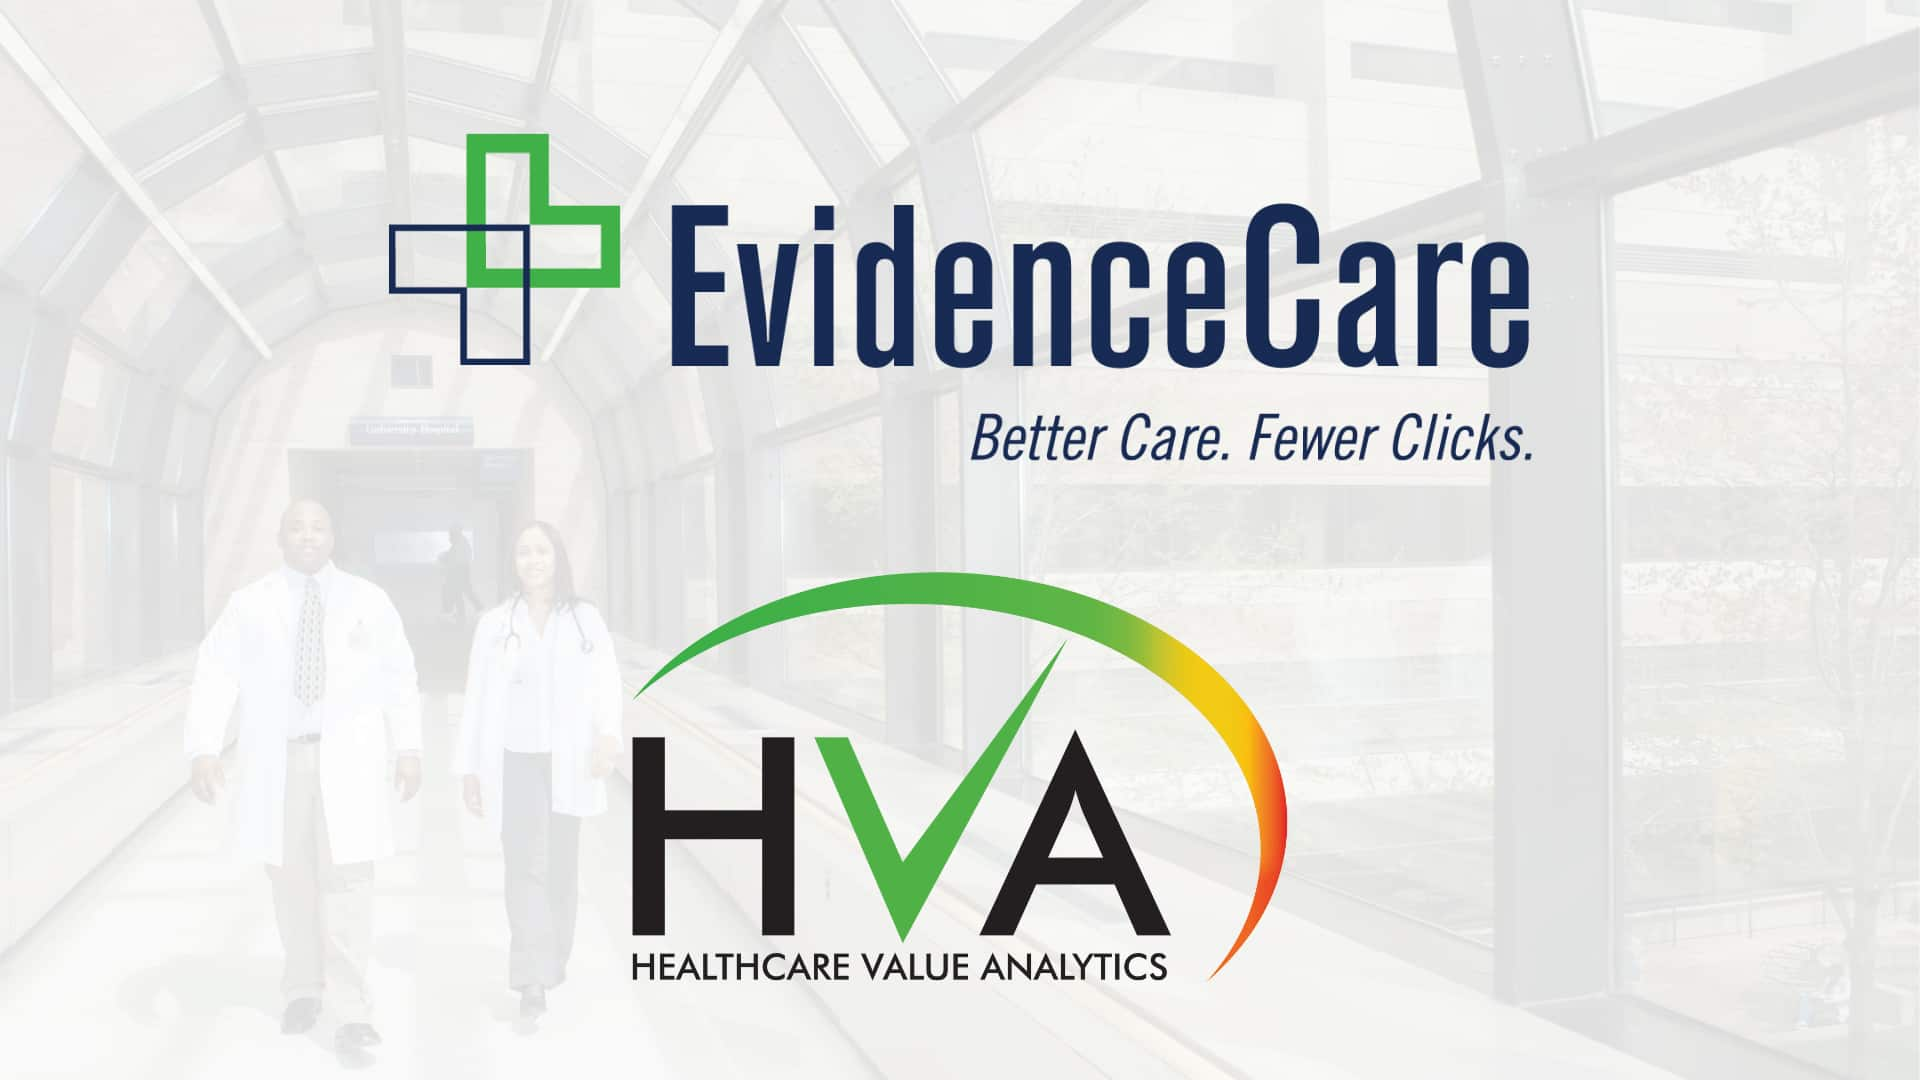 EvidenceCare Acquires Healthcare Value Analytics (HVA)